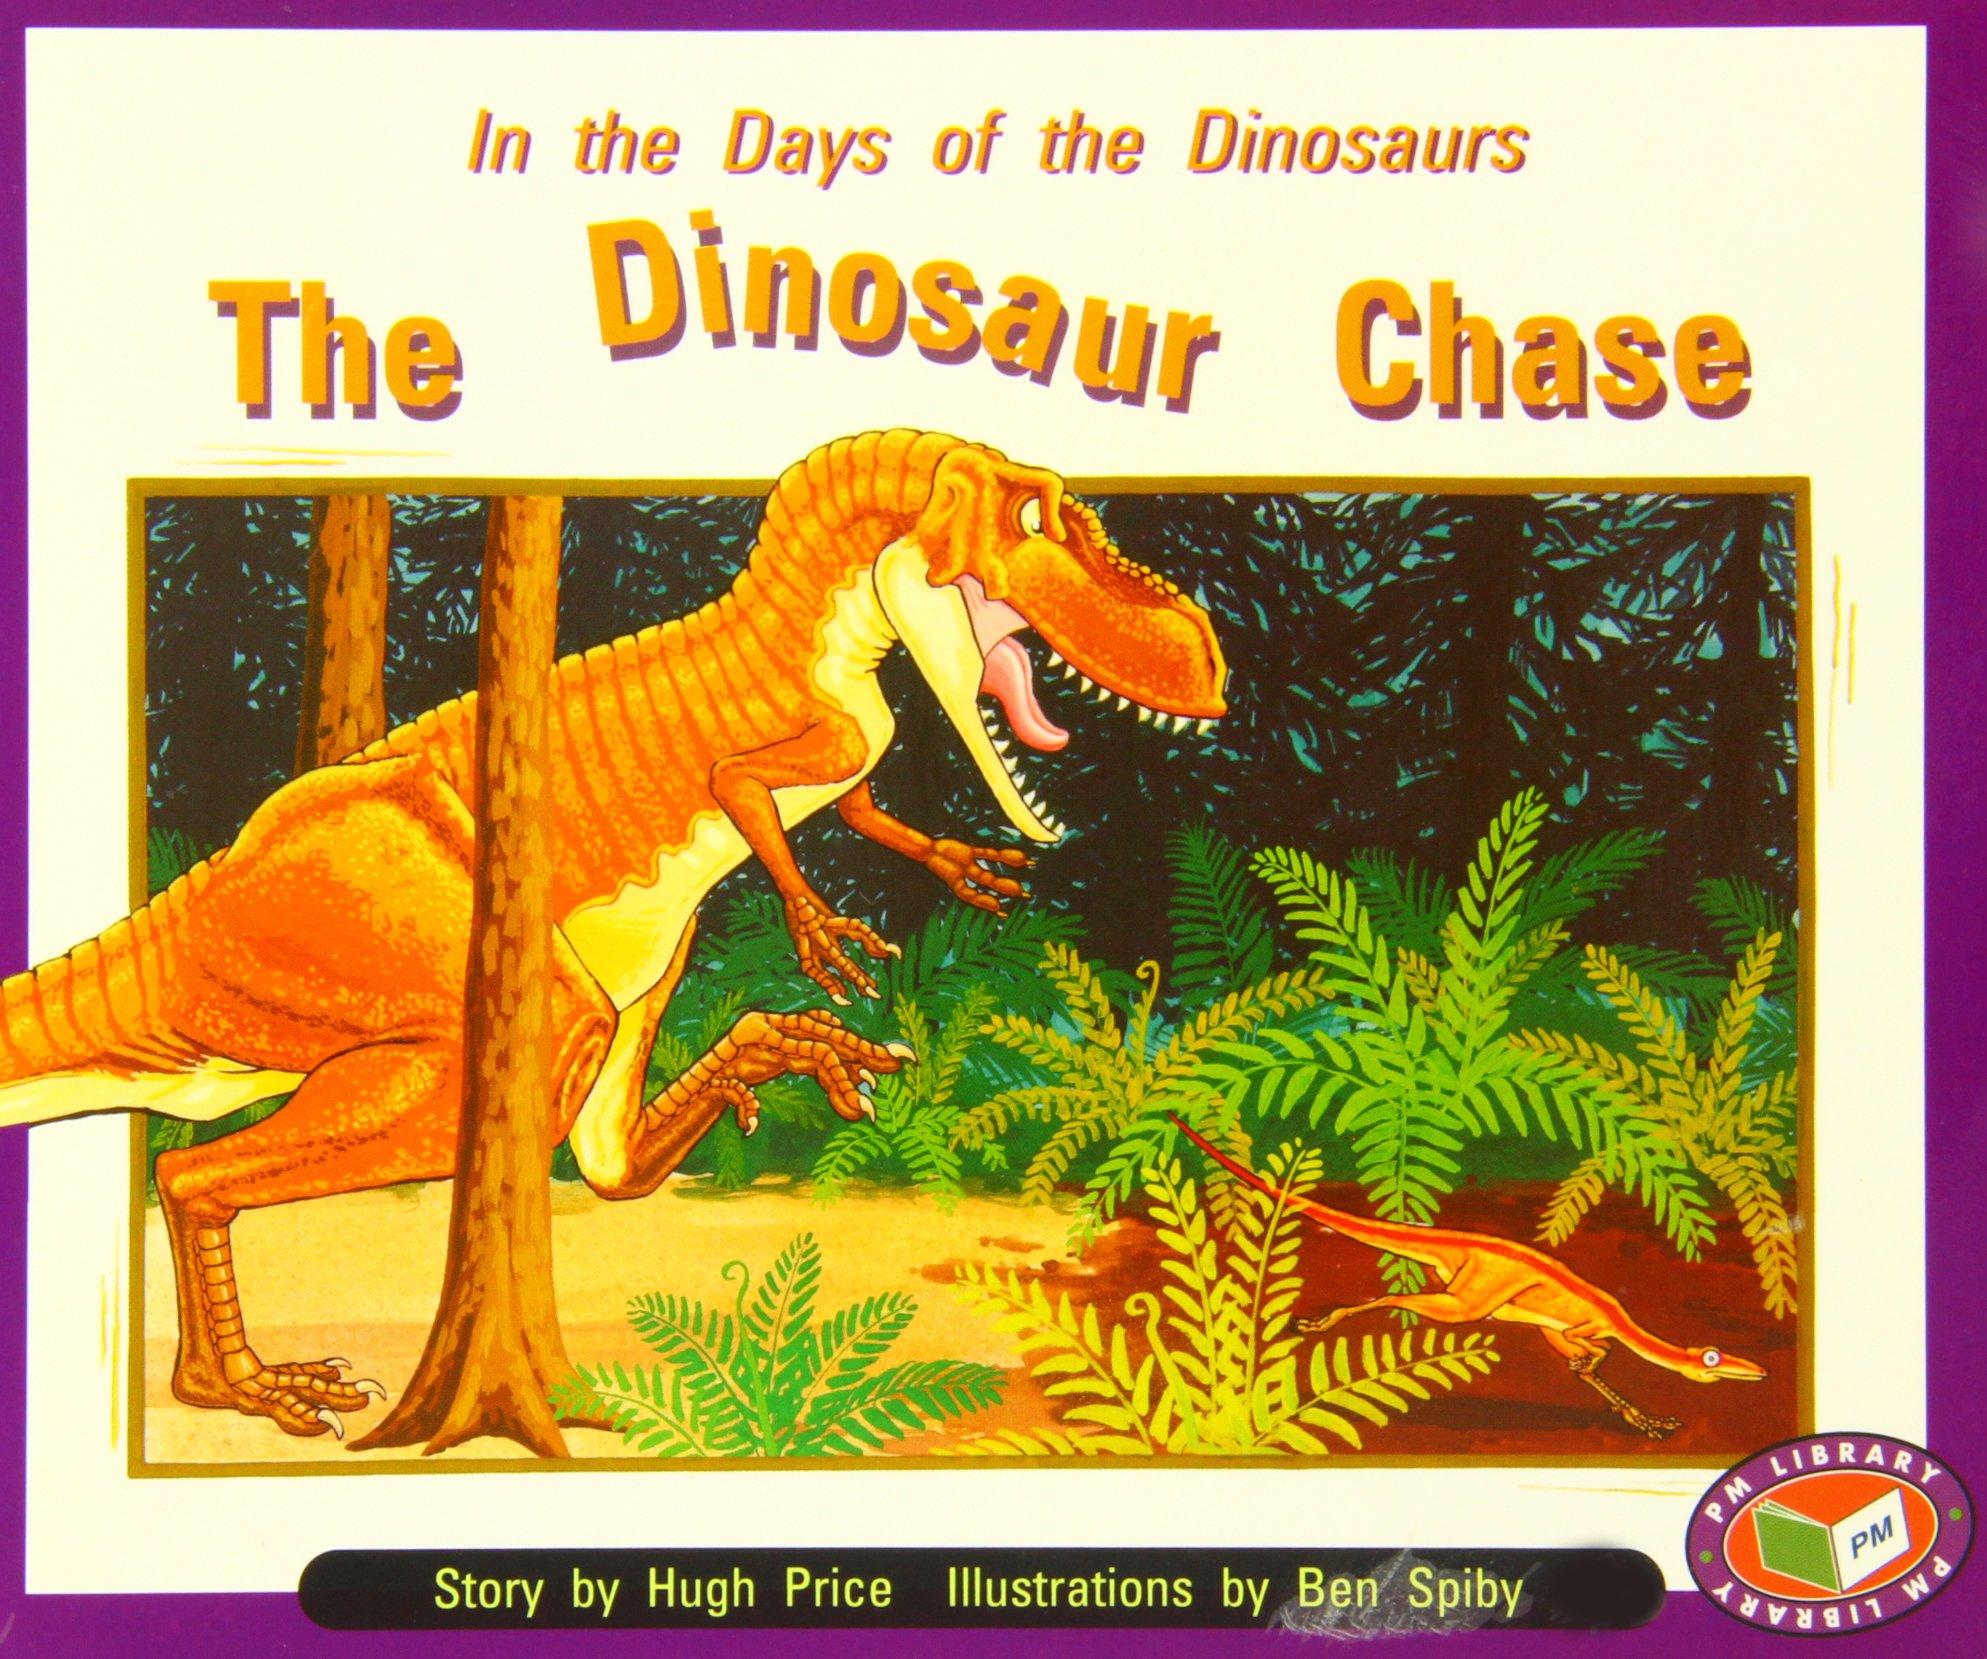 The Dinosaur Chase